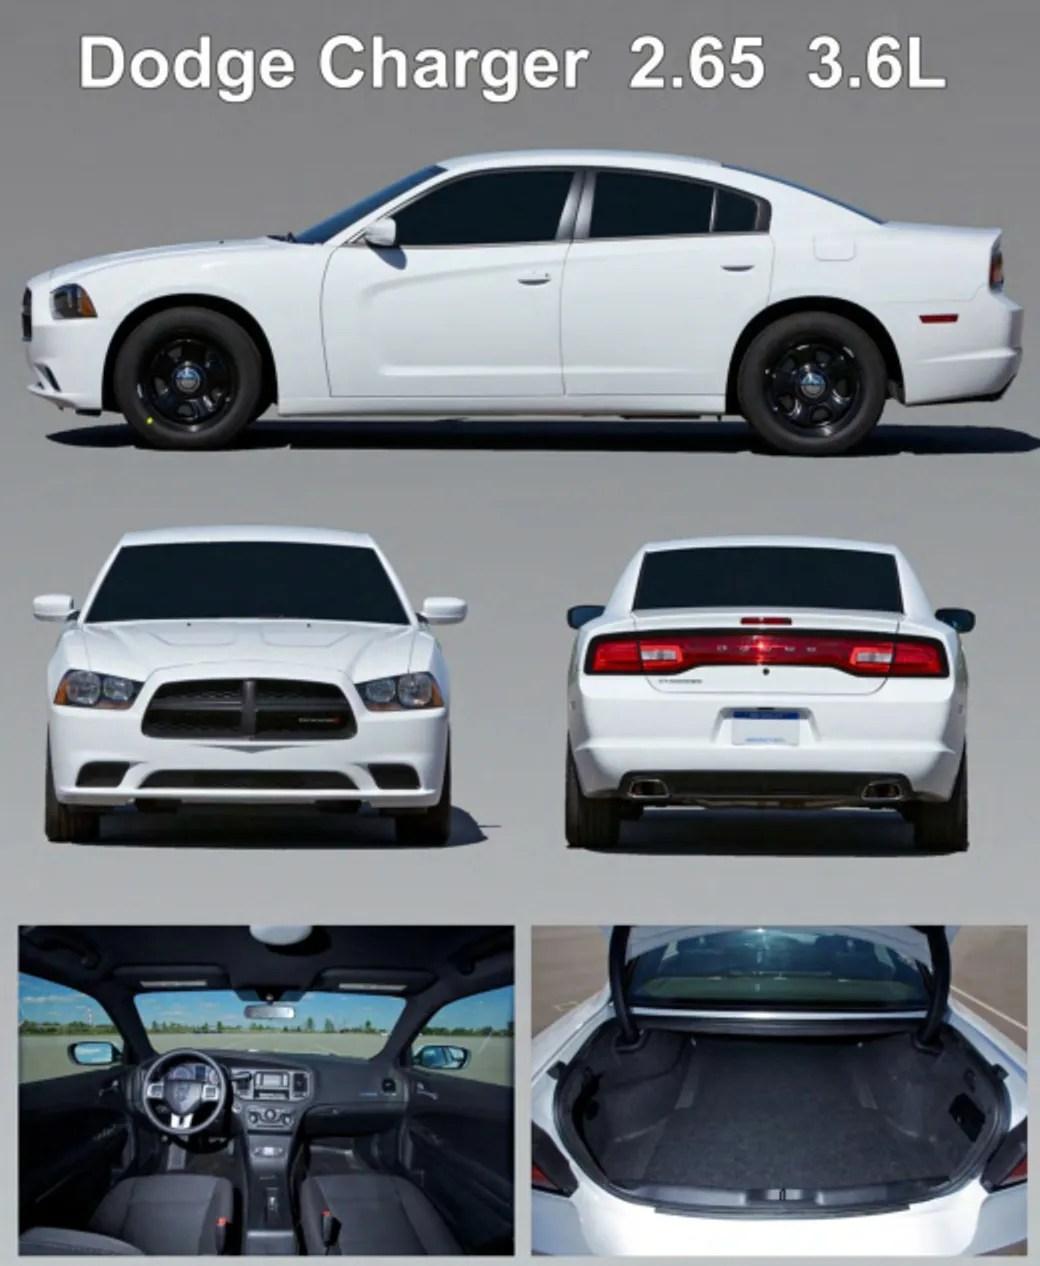 Dodge Charger Brush Guard : dodge, charger, brush, guard, Ultimate, Dodge:, Dodge, Charger, Bumper